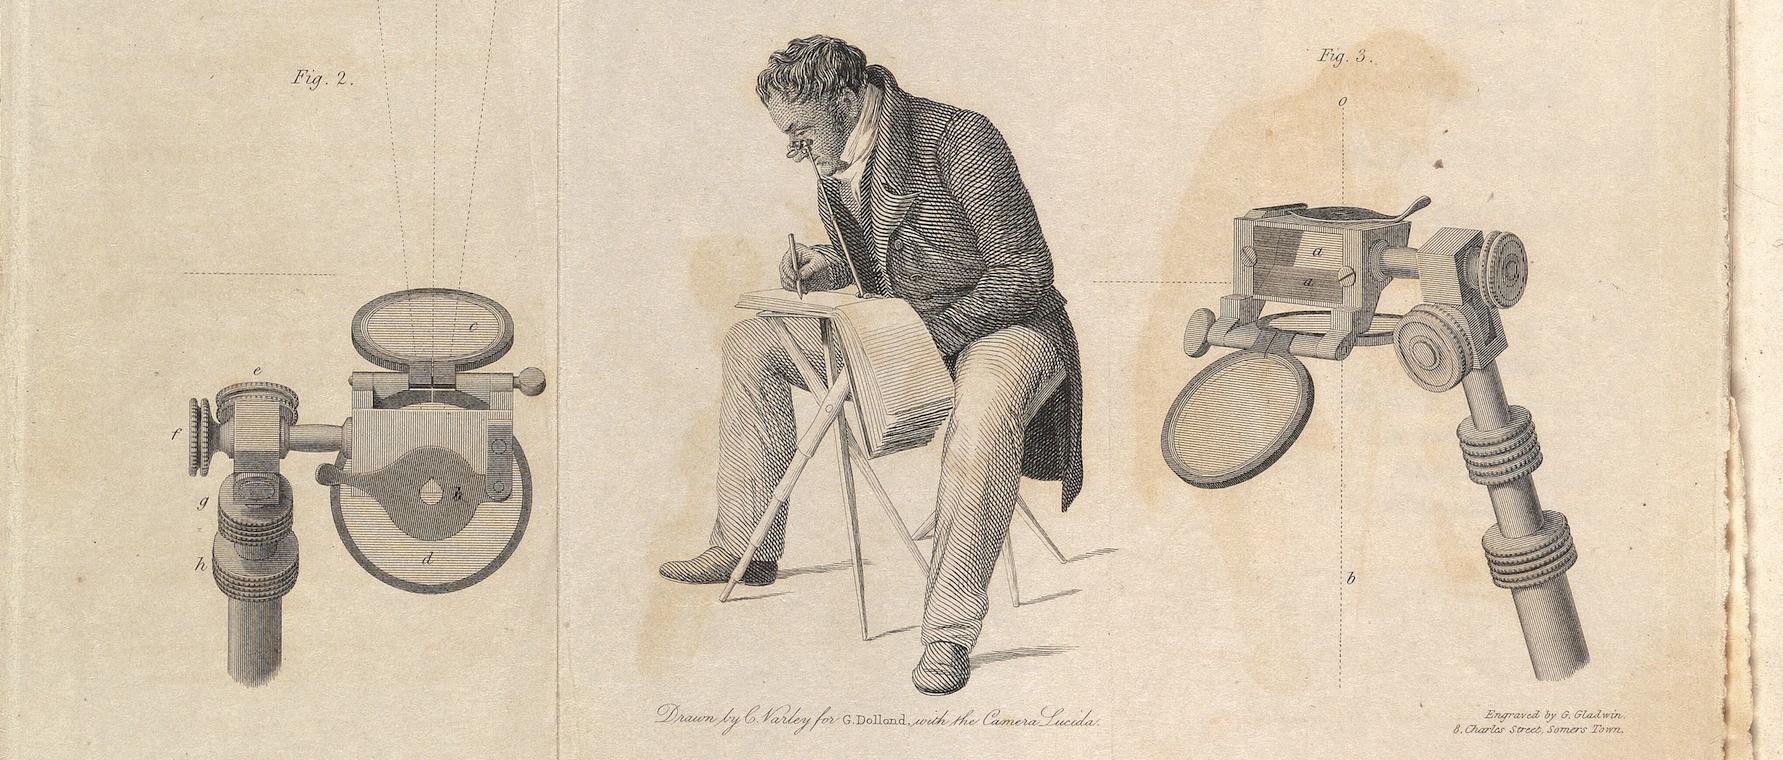 GeorgeDollond_Description of the camera lucida Book Plates 1830 1800px.jpg